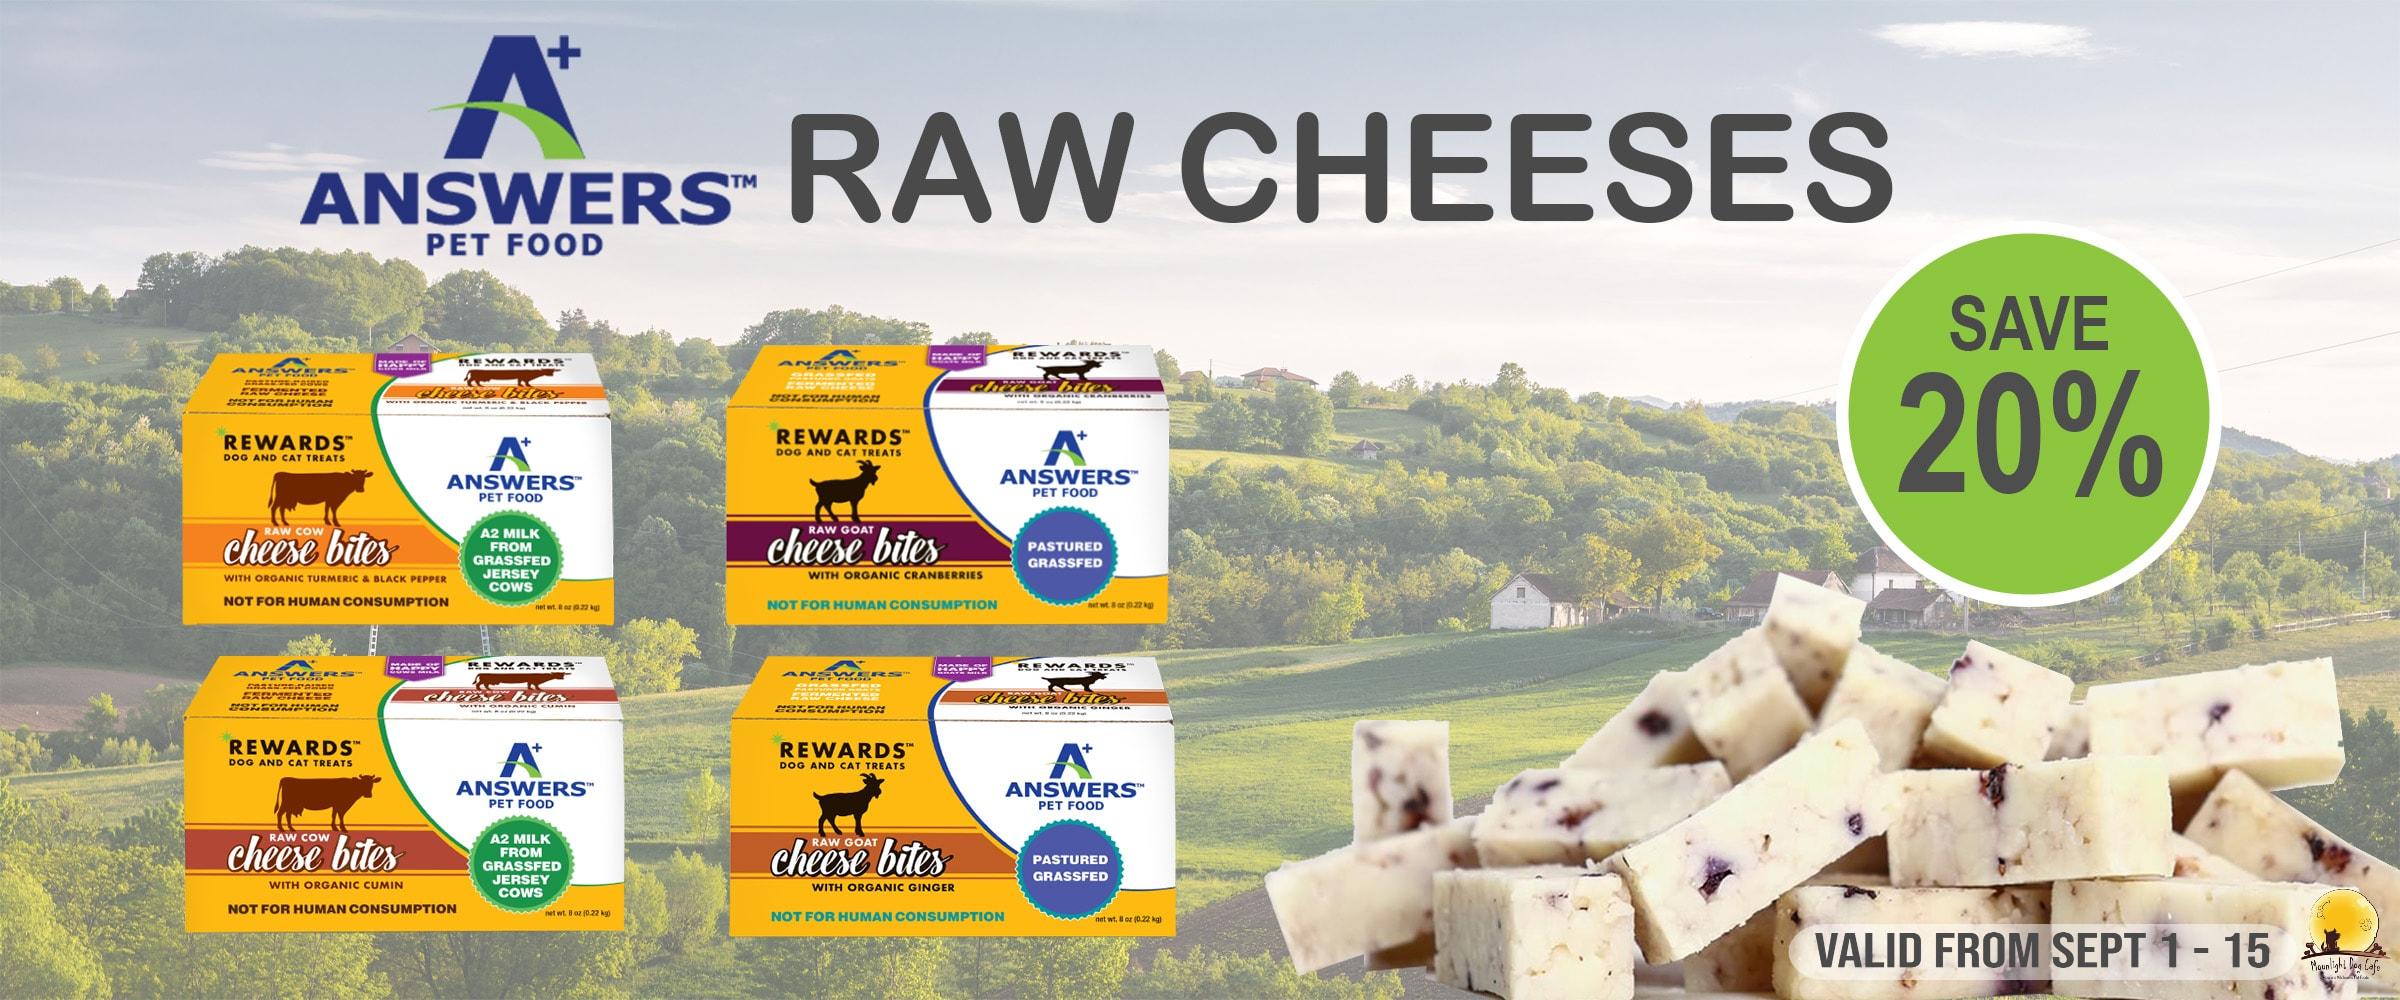 answers dog food, cheese